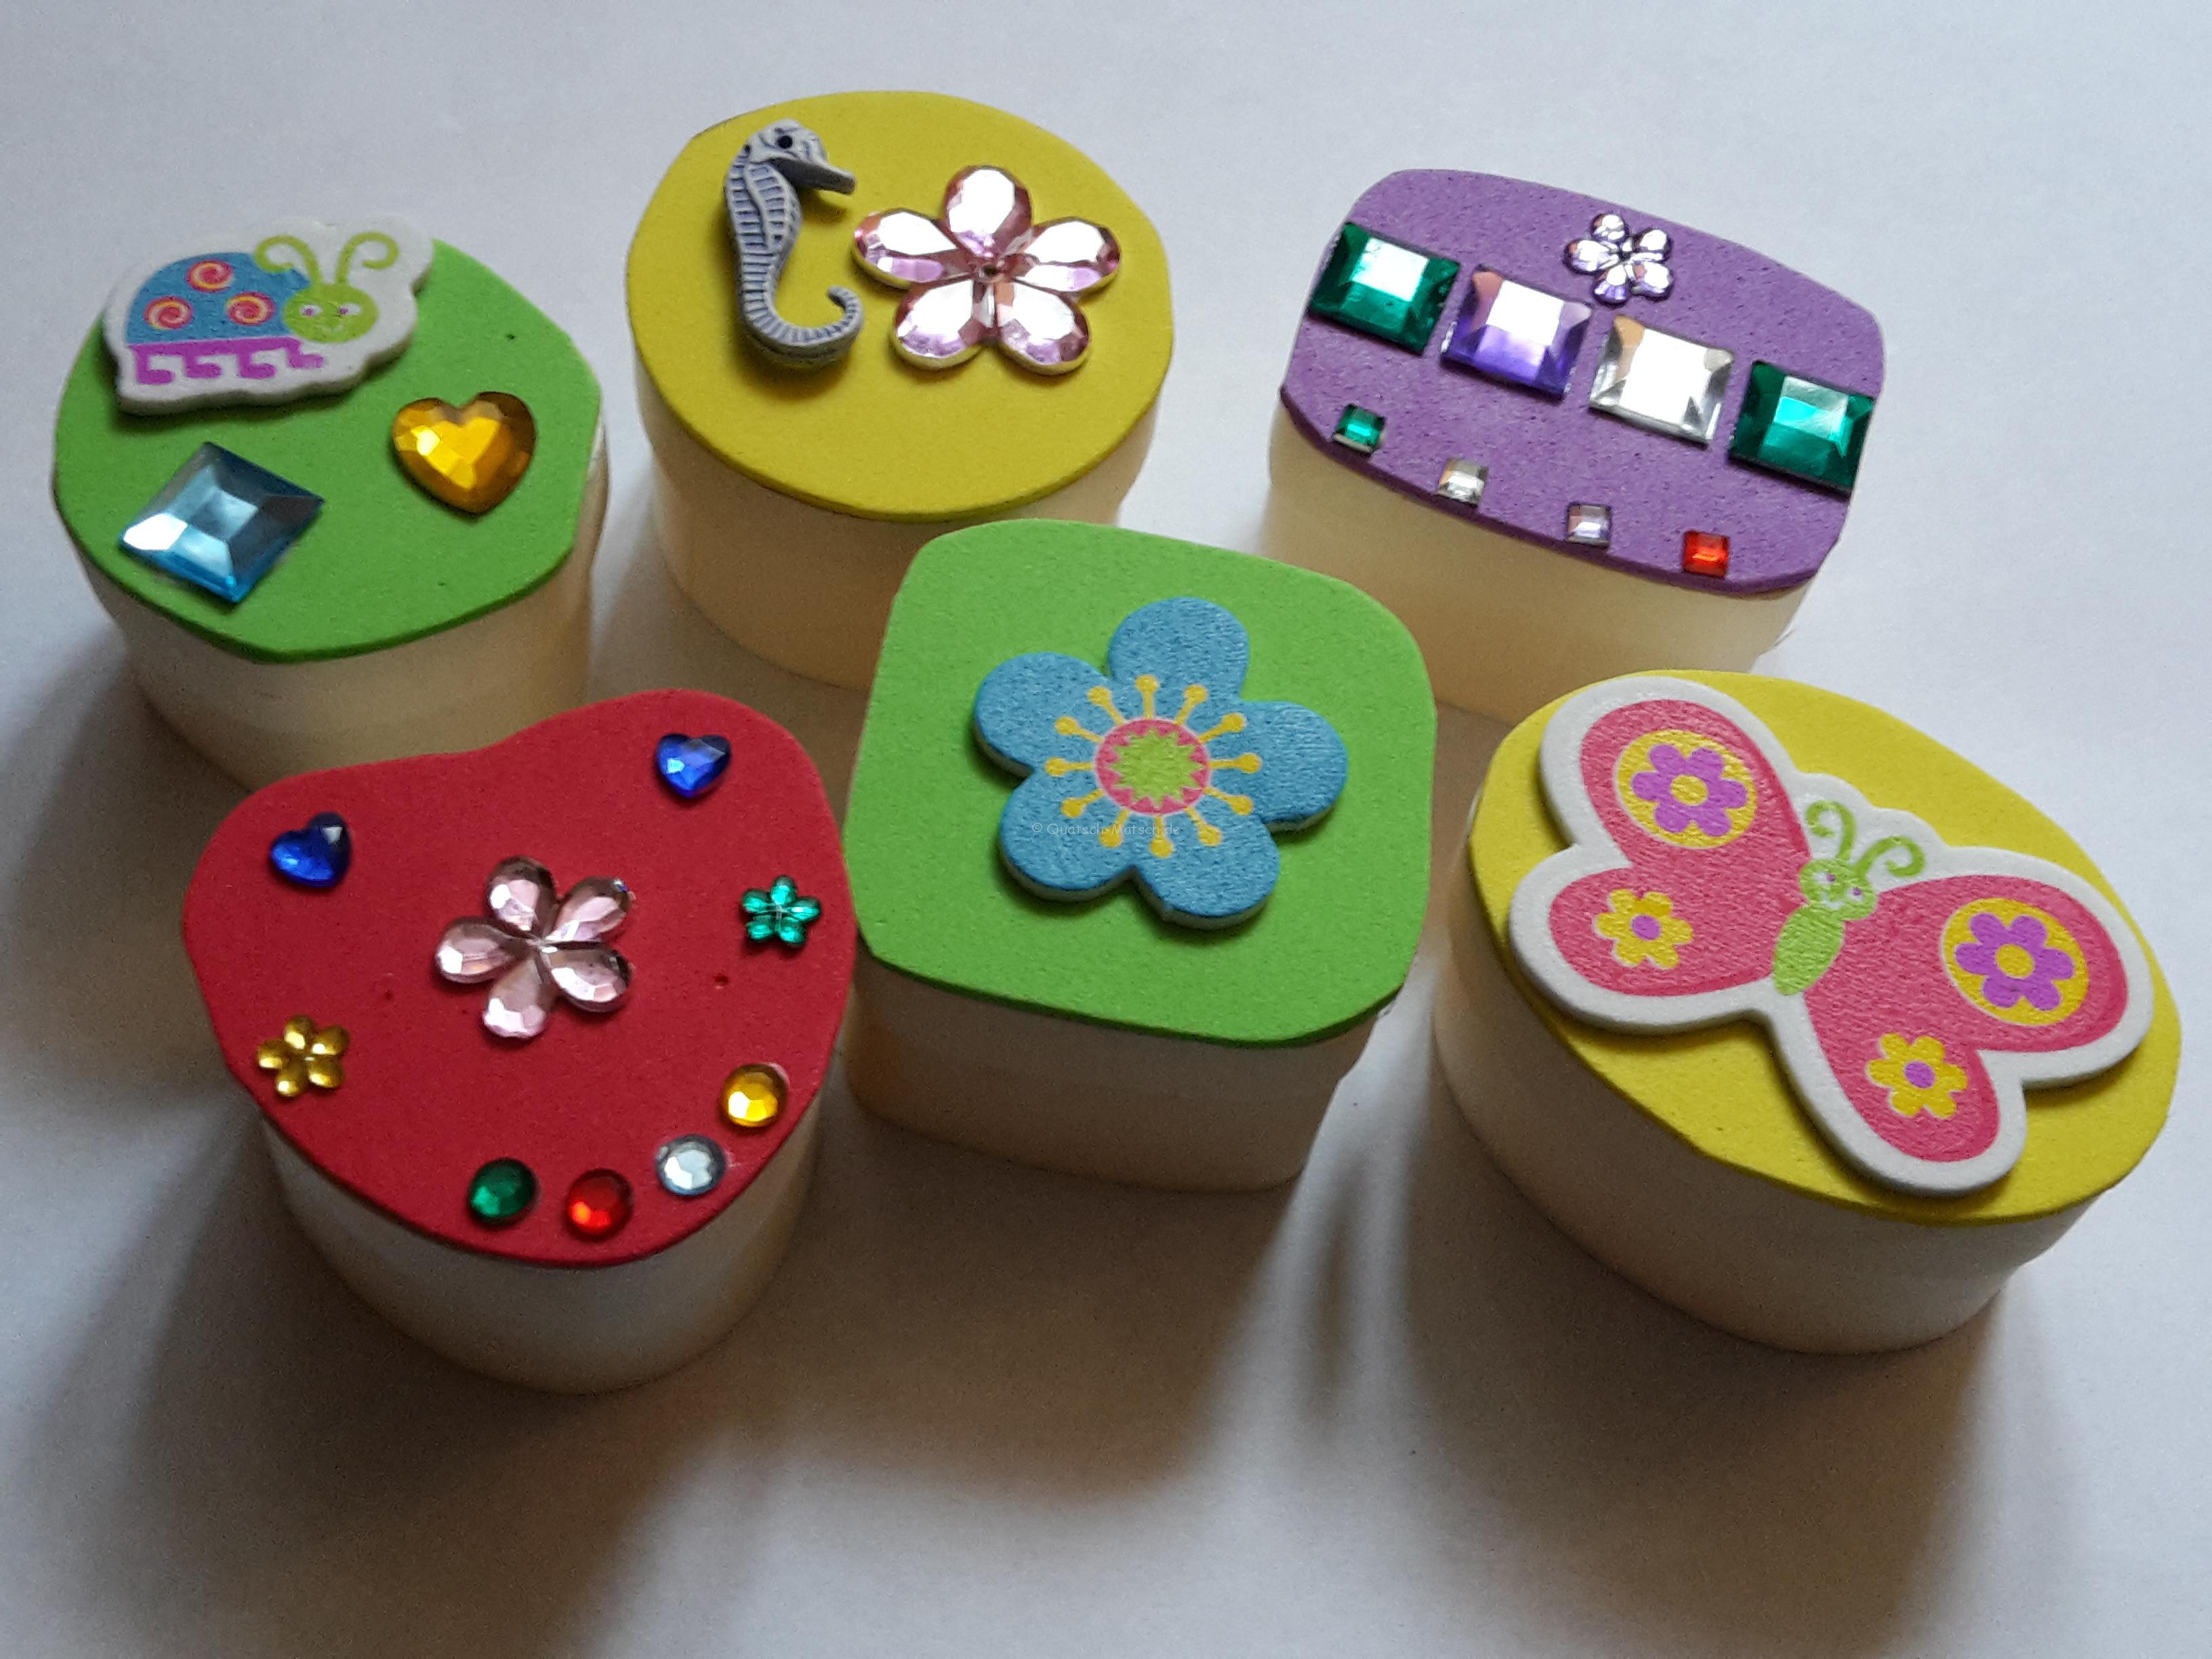 Schachteln mit Moosgummi dekorieren